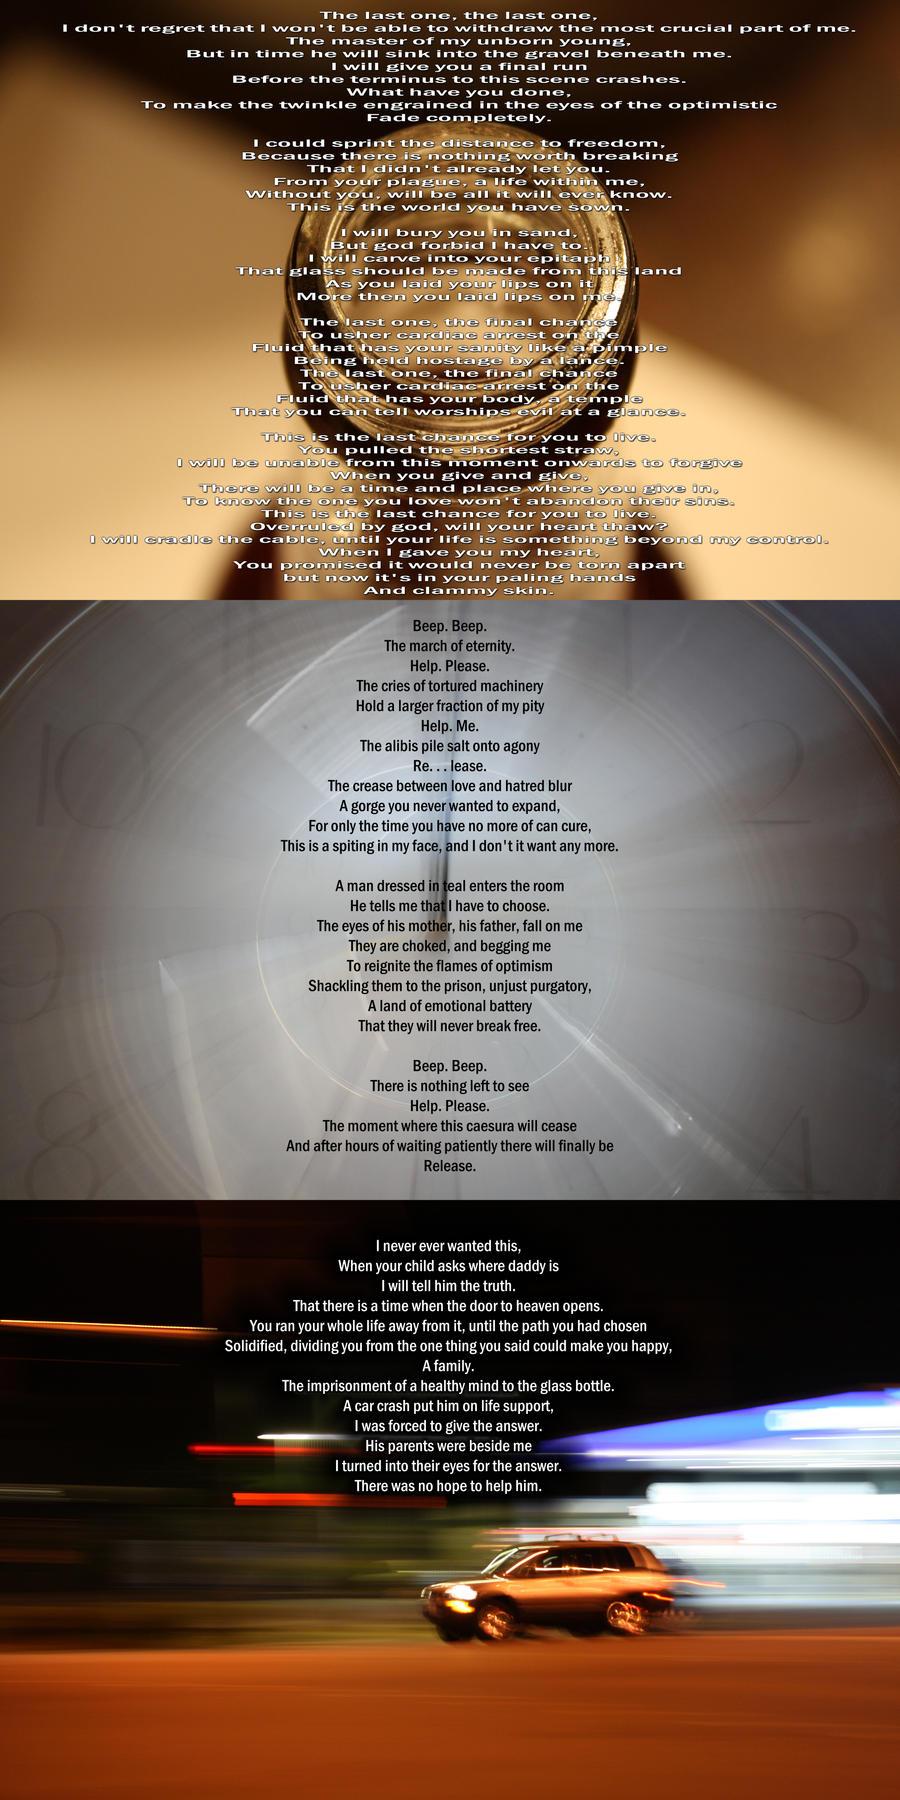 Engleska poezija u slici Euthanasia_by_retr_o_bute-d4lgh7q